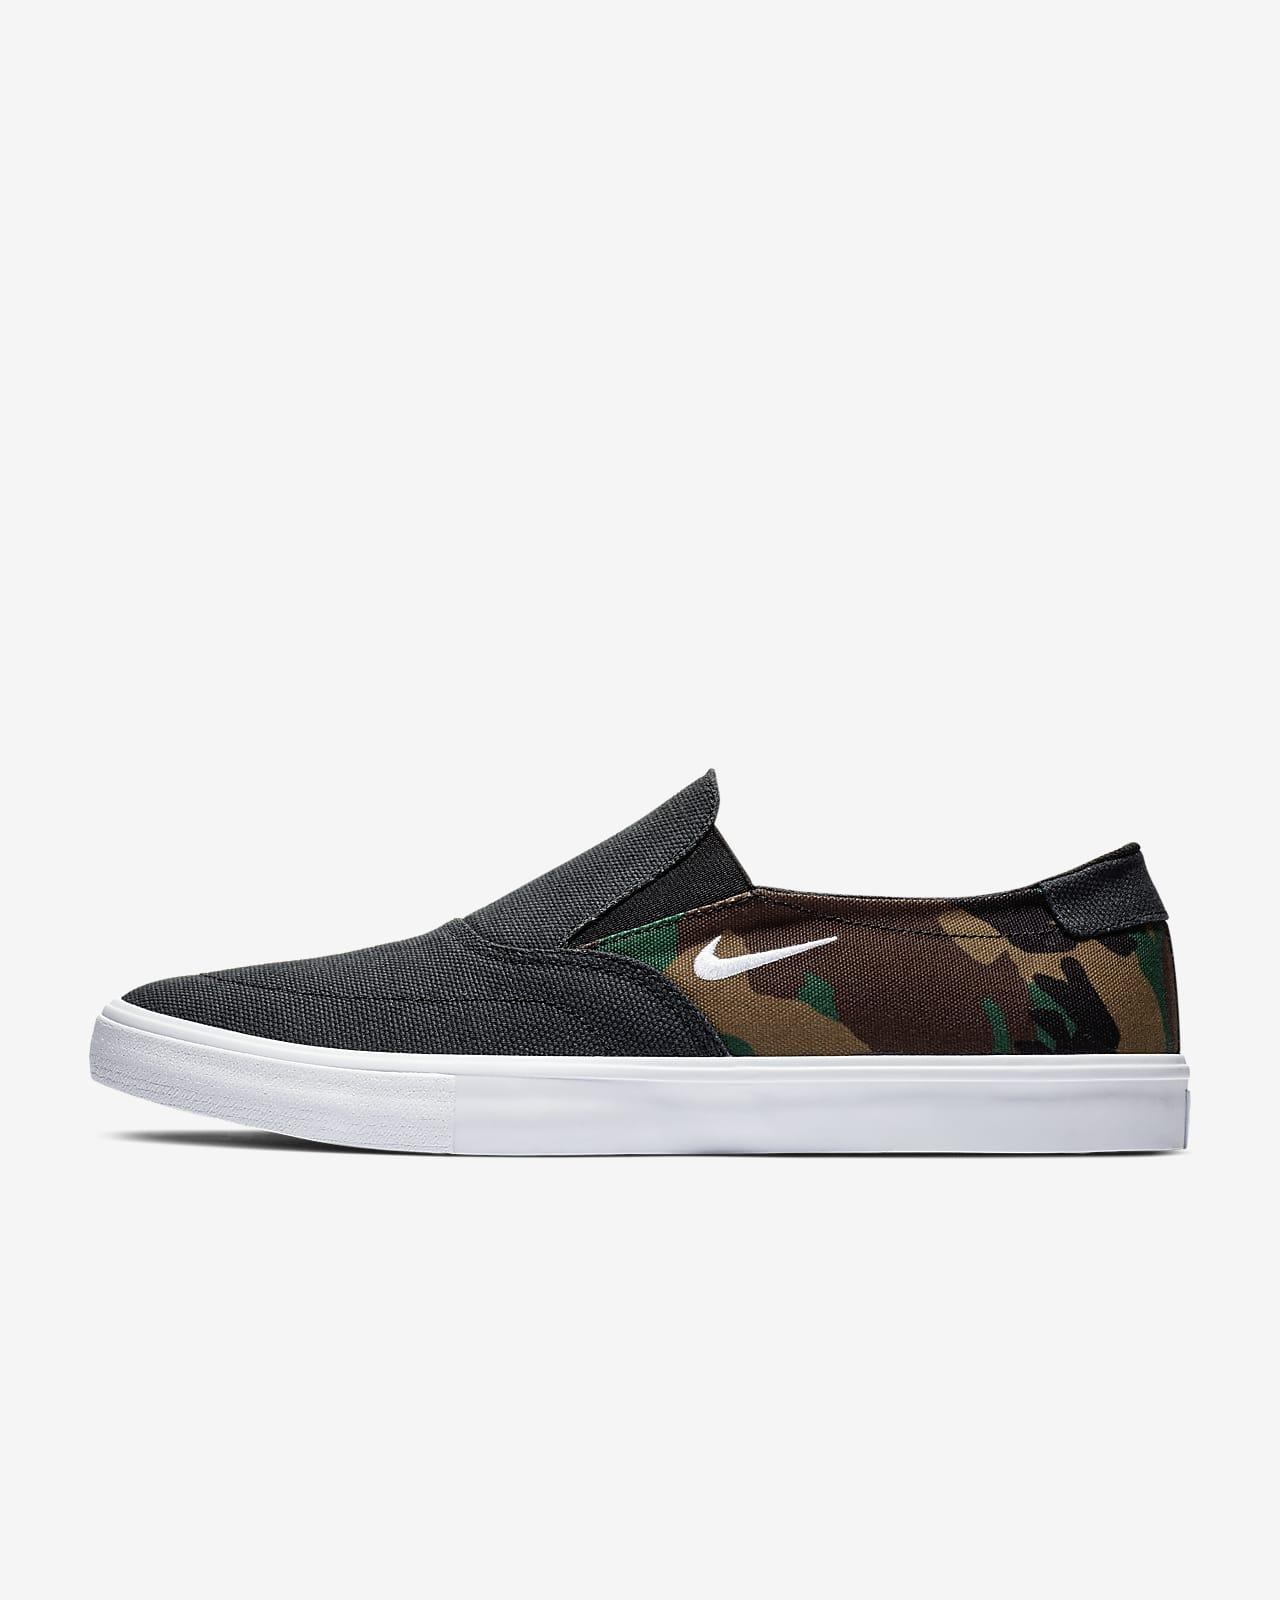 Calzado de skateboarding para hombre Nike SB Portmore 2 Solarsoft Slip